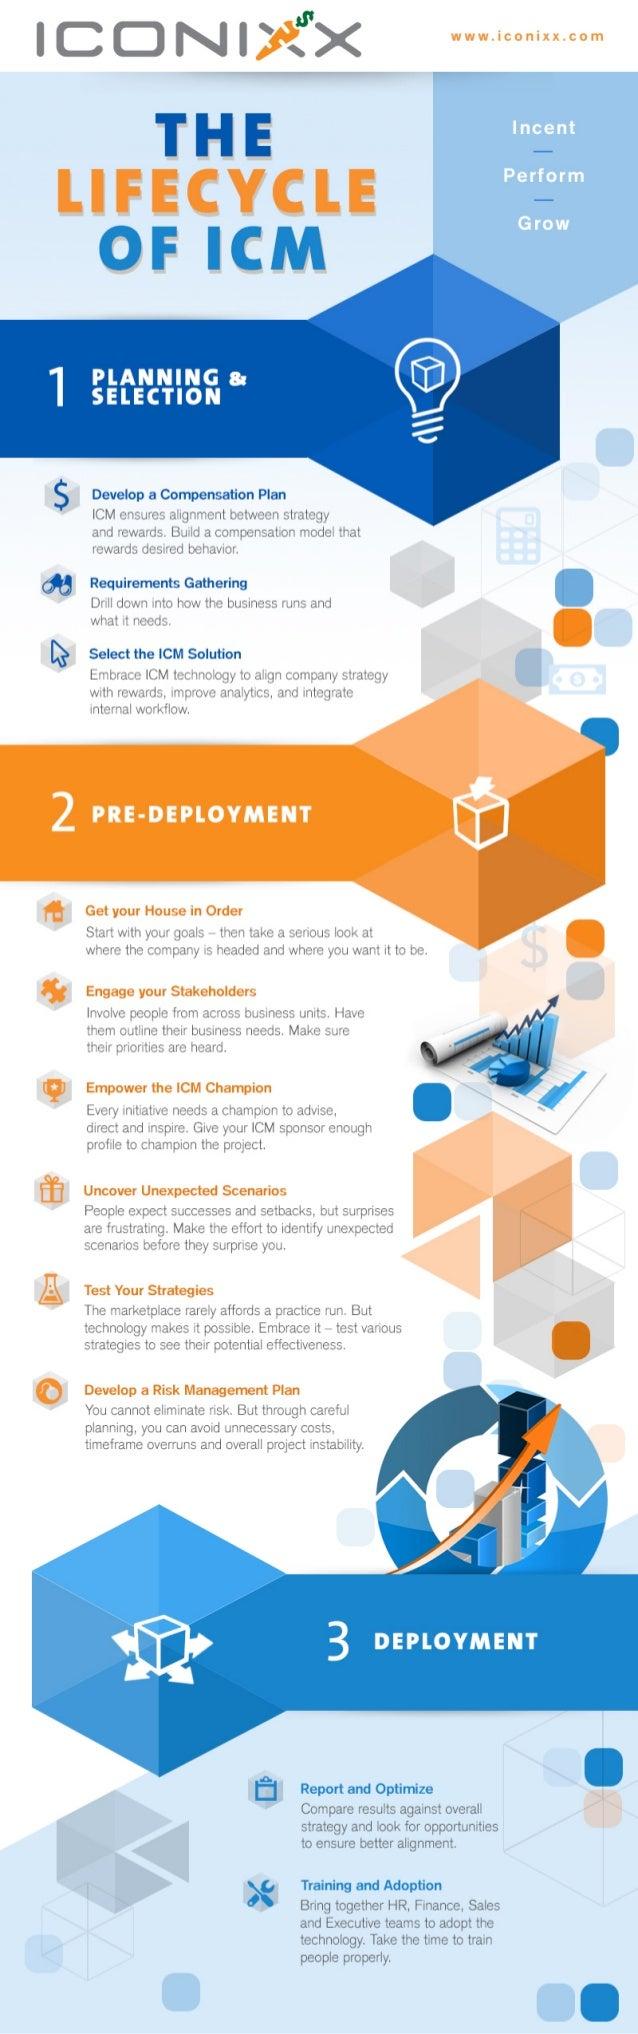 The Lifecycle of ICM Iconixx Infographic